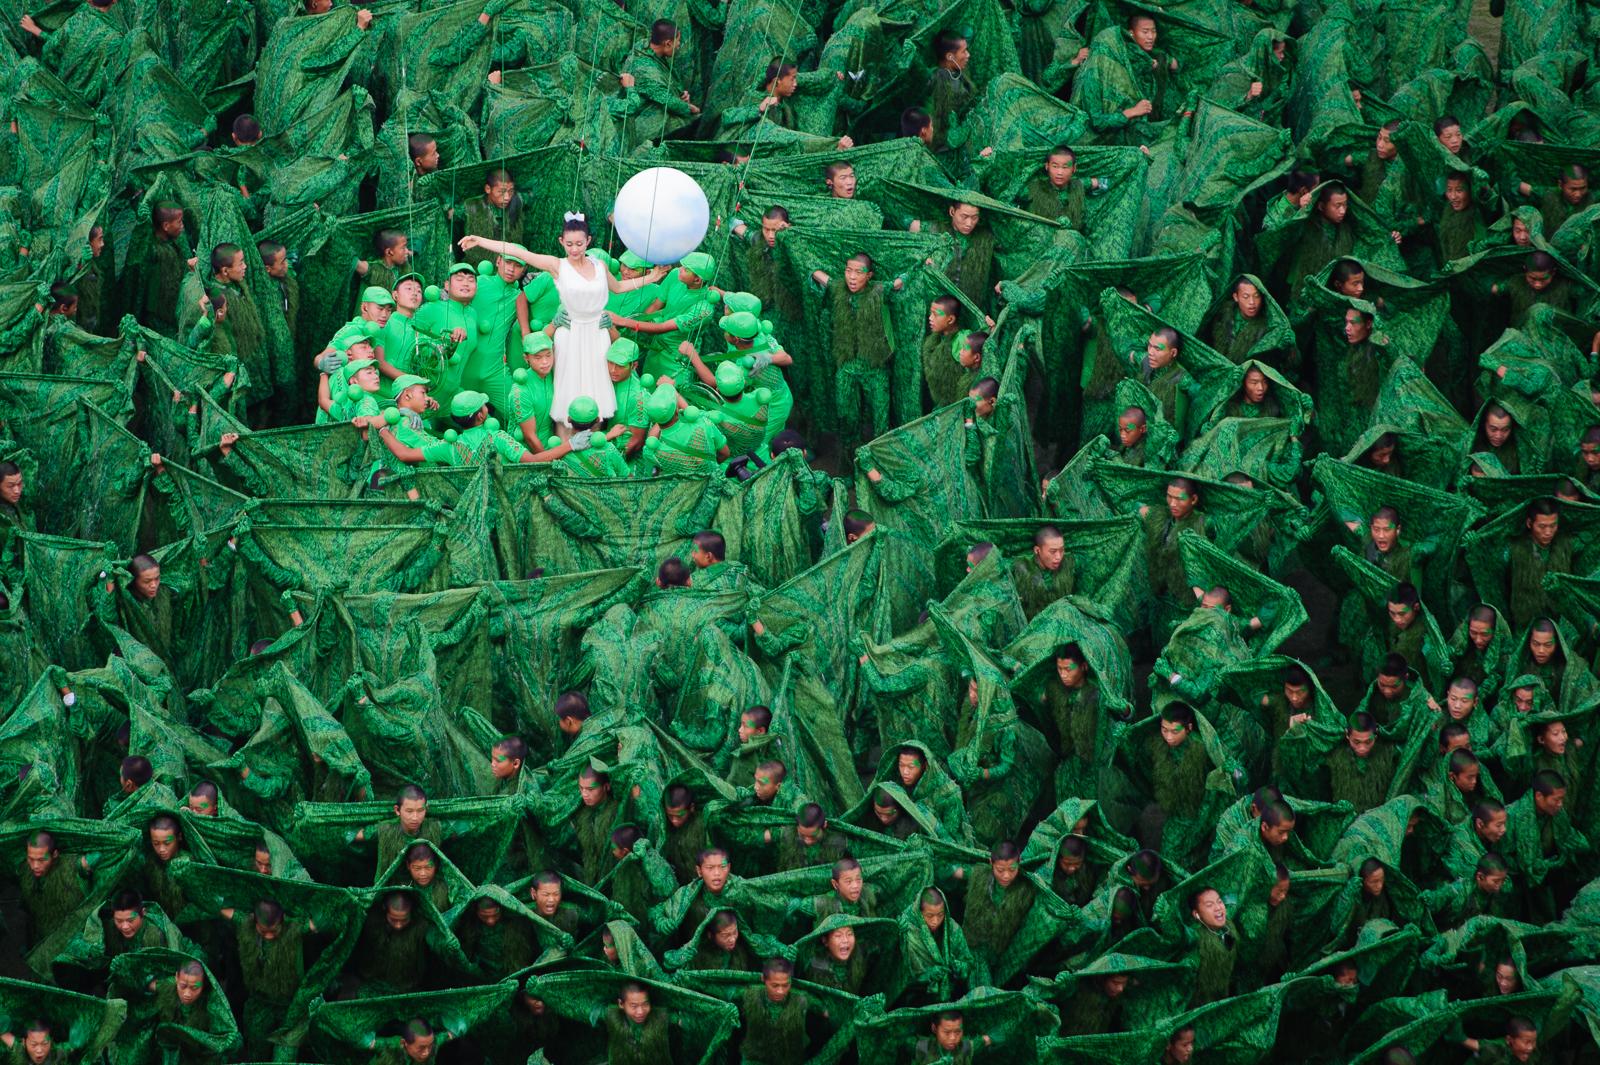 Otvárací ceremoniál Majstrovstiev Sveta v atletike 2015, 22.08.2015, Peking, Čína